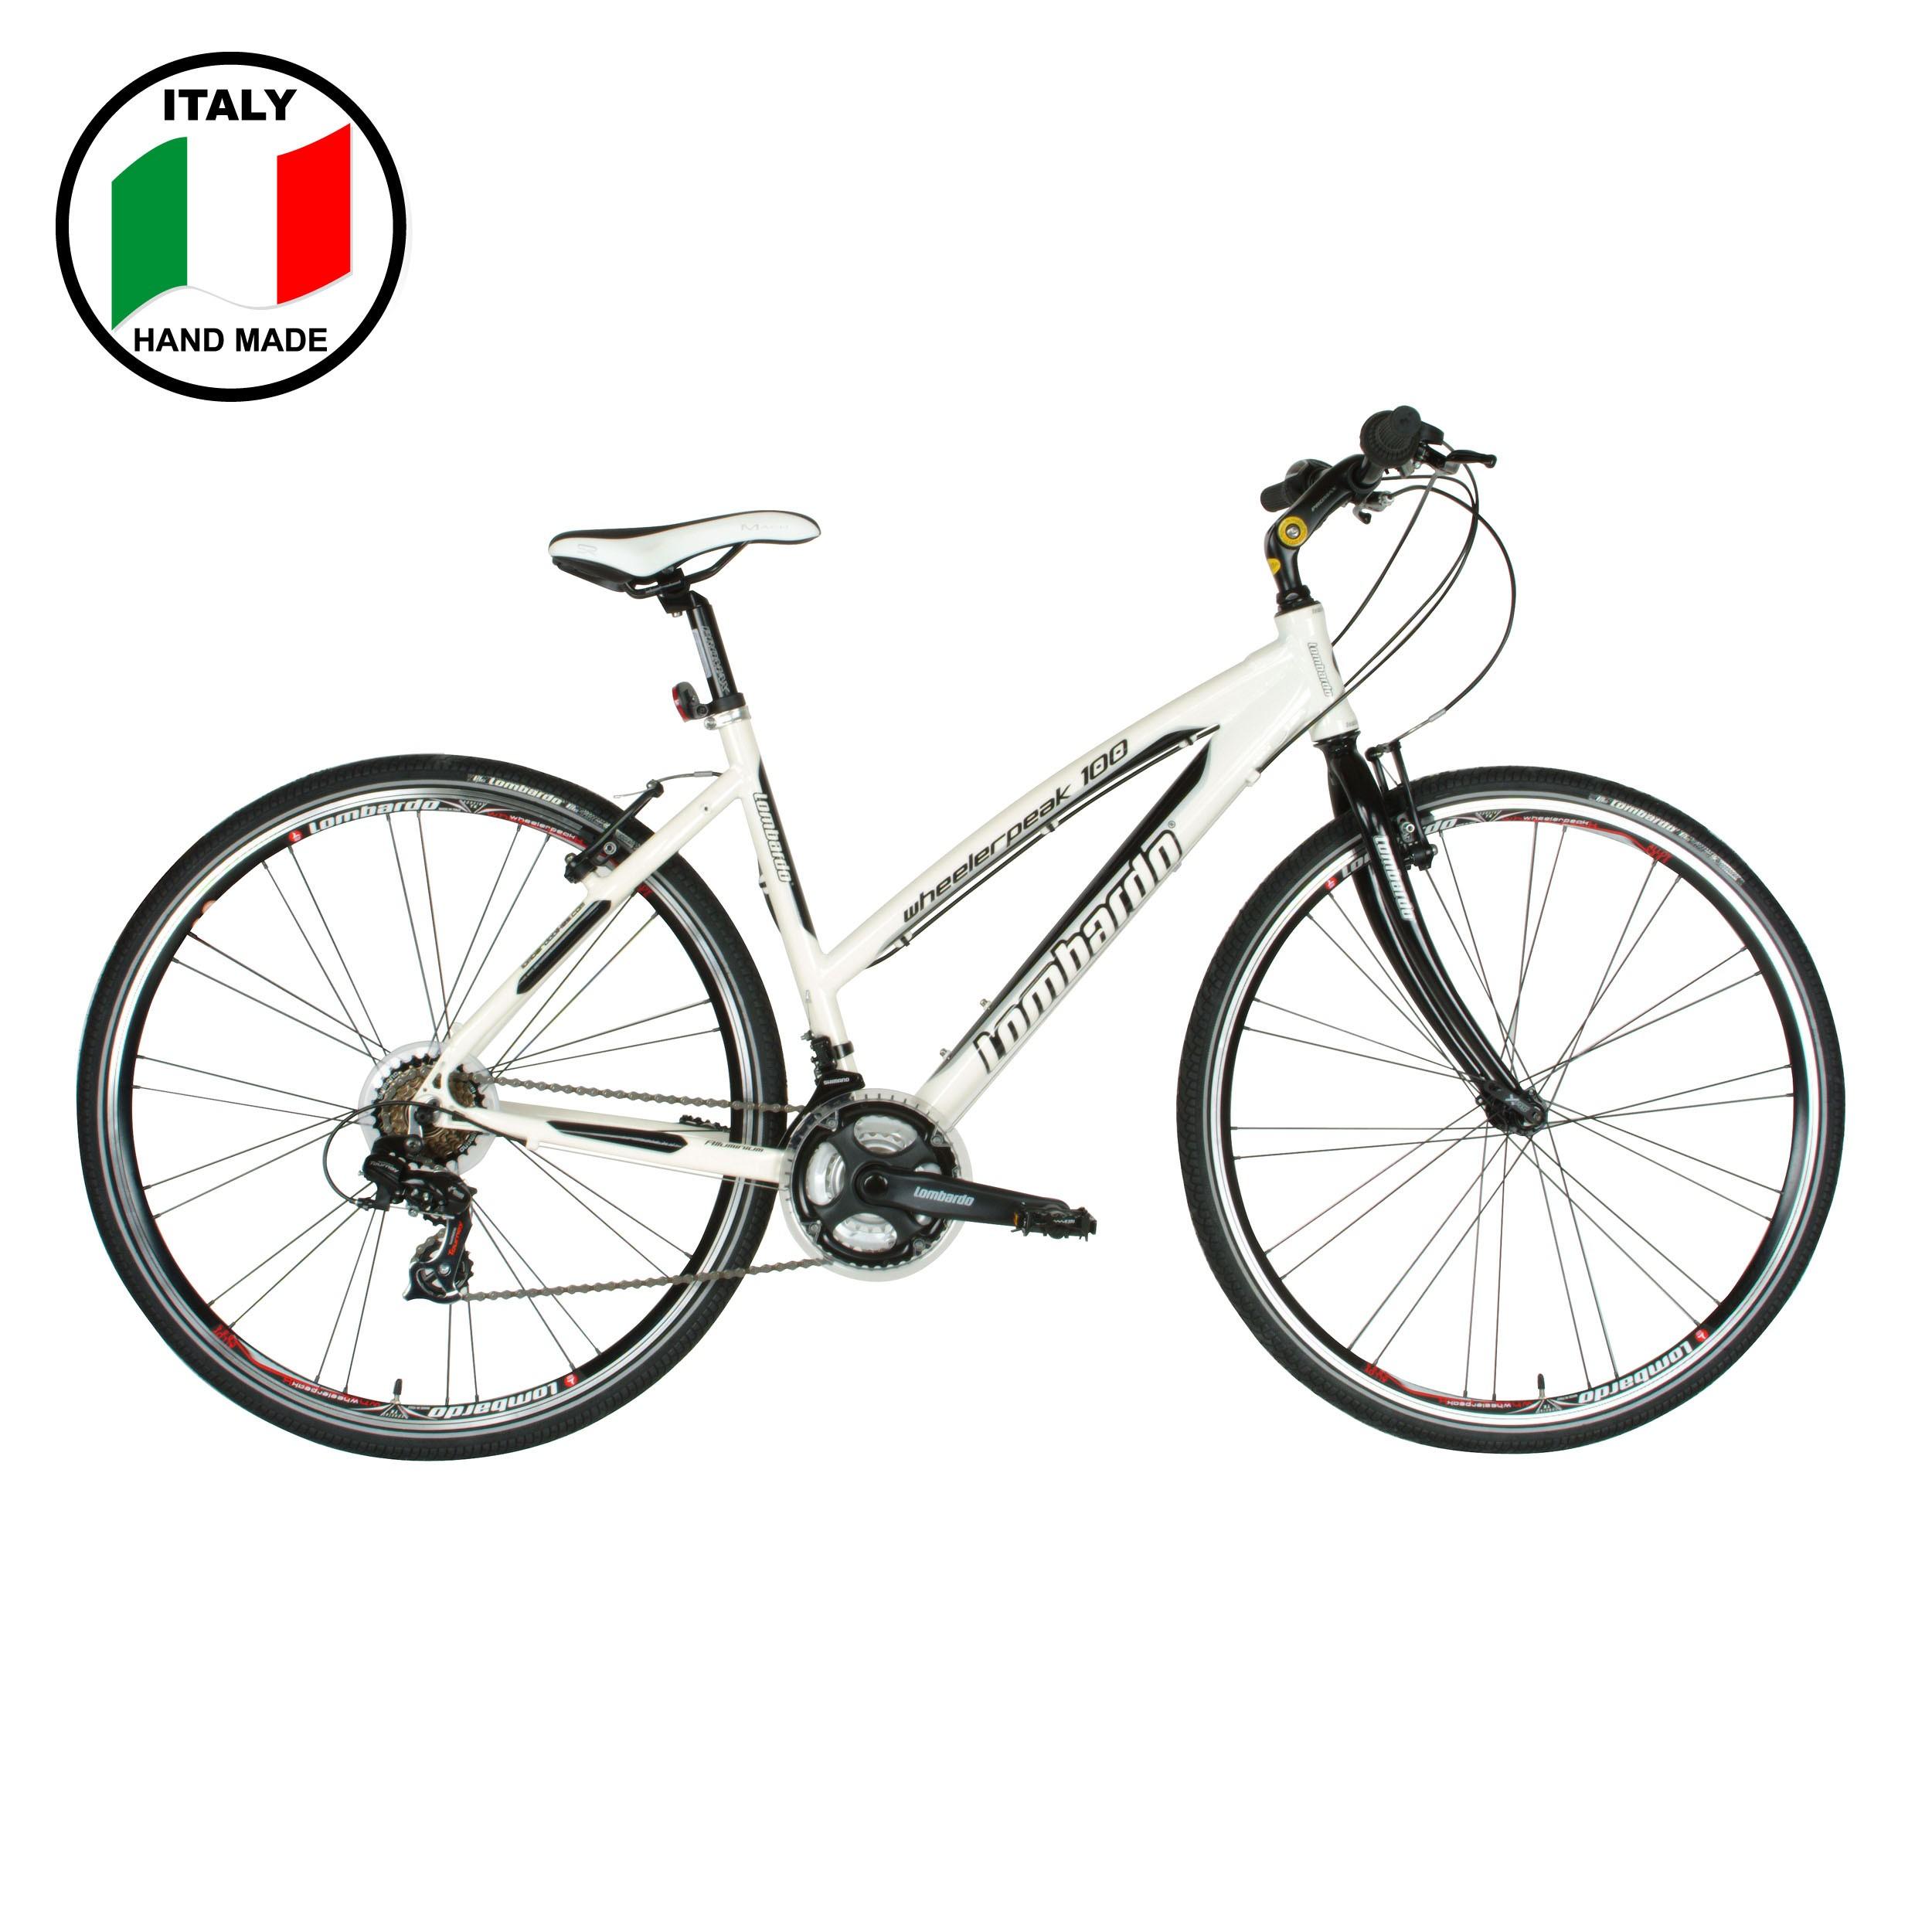 Lombardo Wheelerpeak 100 28 inch Bike- White